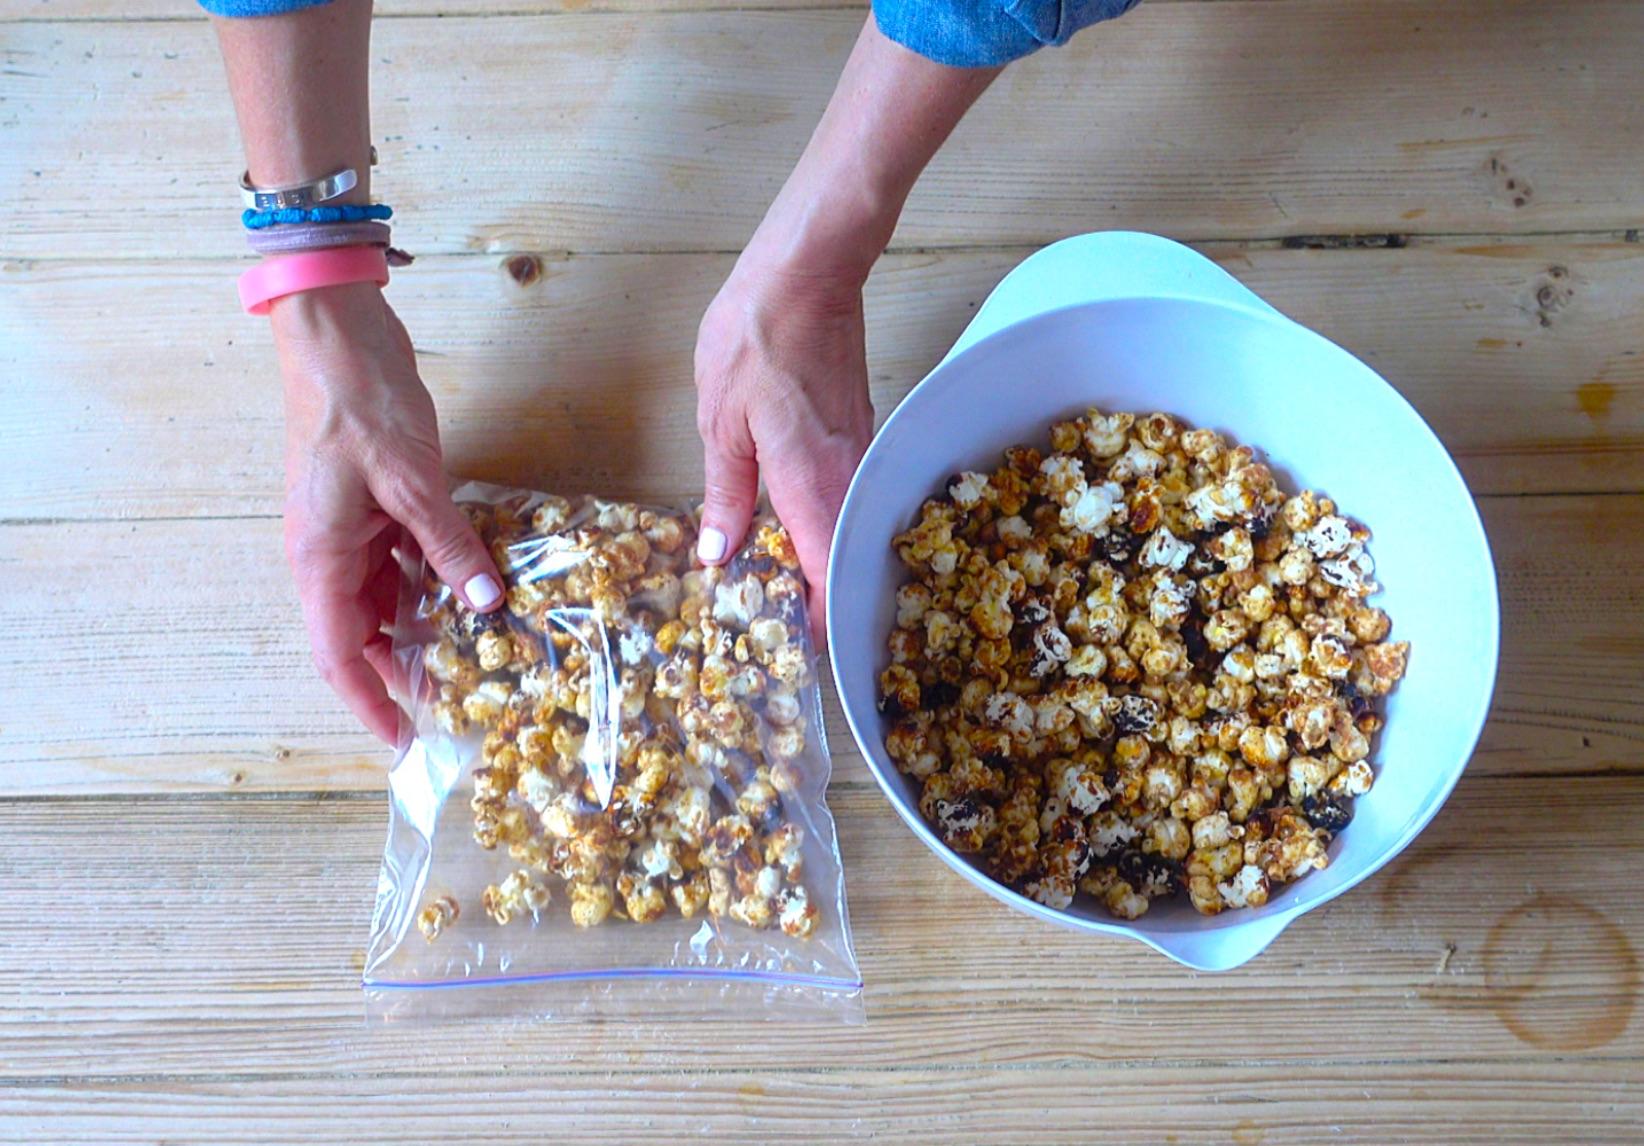 Toffee Caramel Popcorn